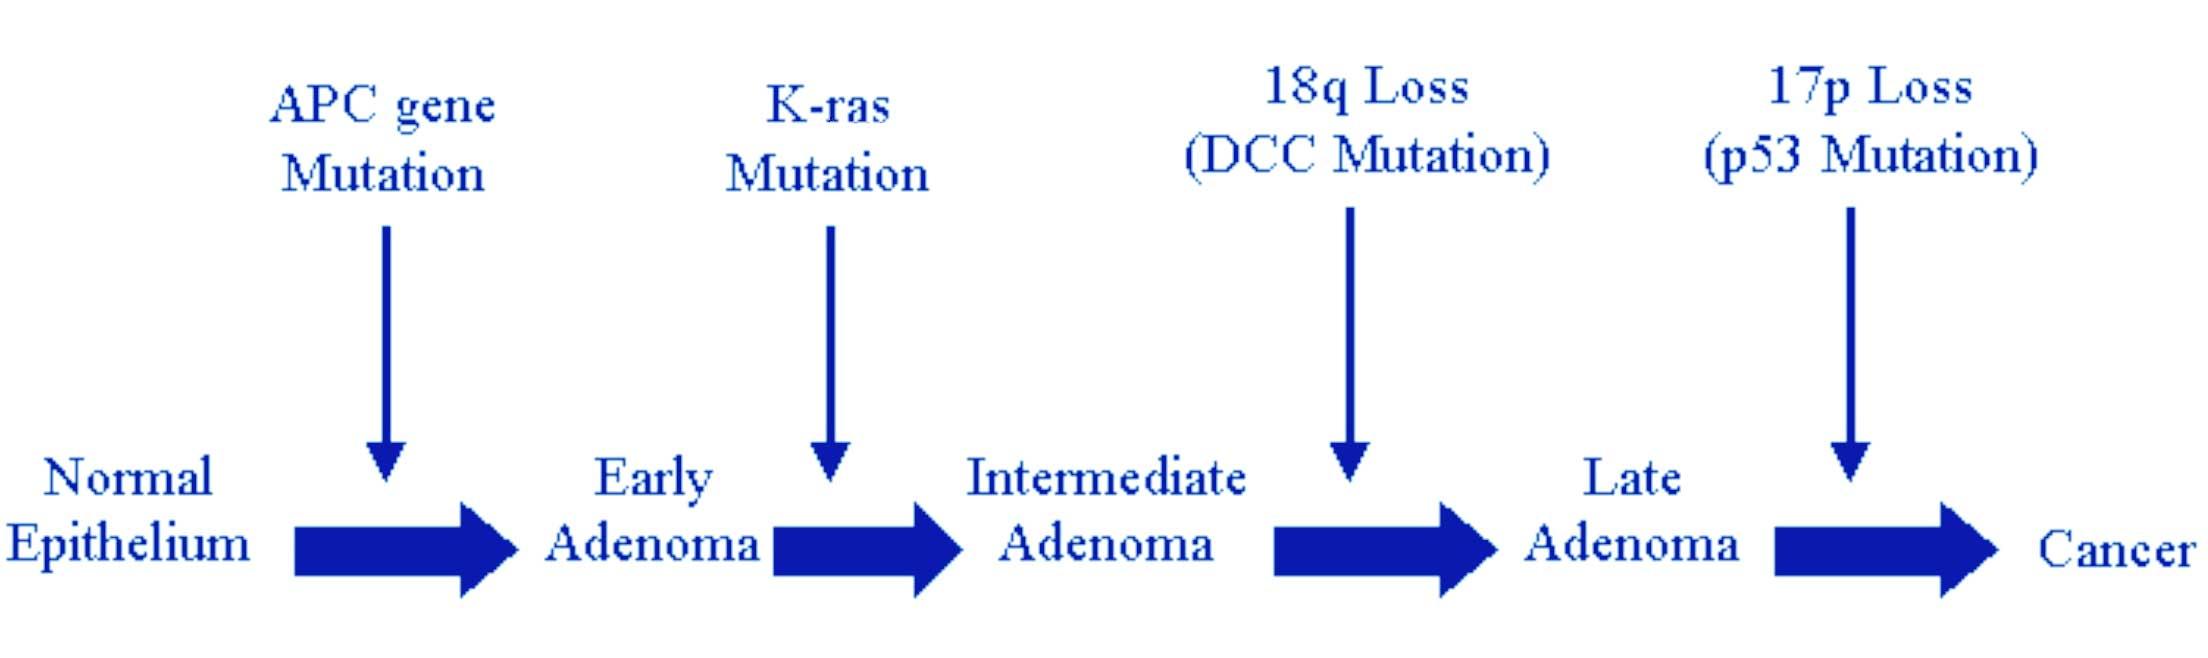 Test de predispozitie la cancerul de colon (APC, MUTYH, MLH1, MSH2, MSH6, EPCAM, STK11)